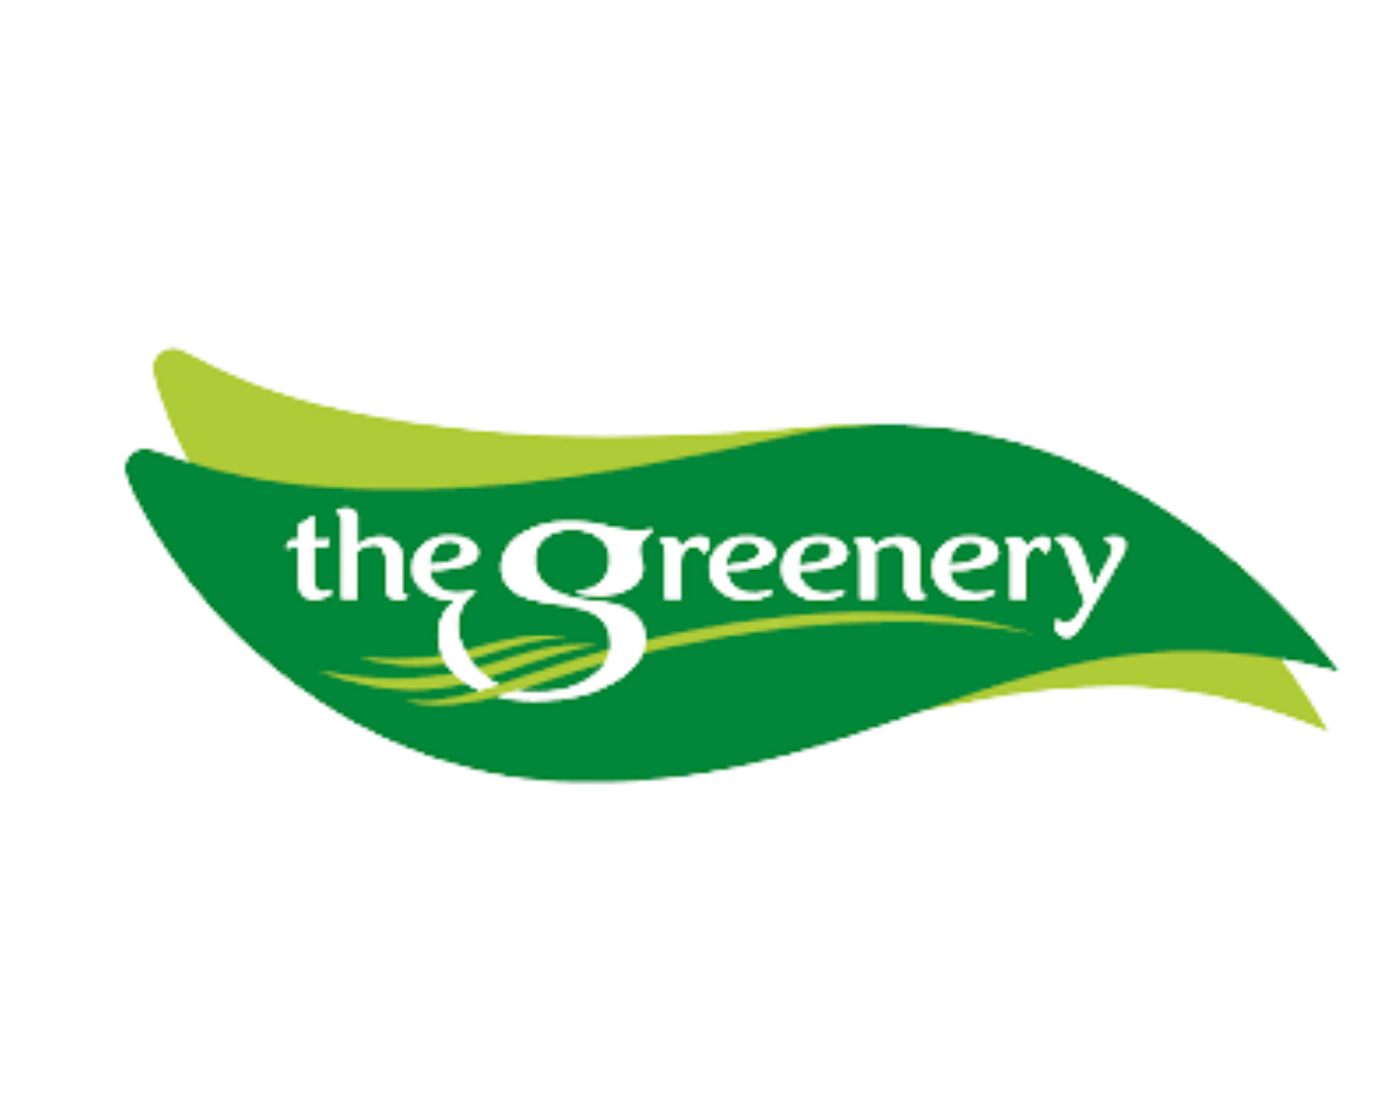 le logo de la verdure